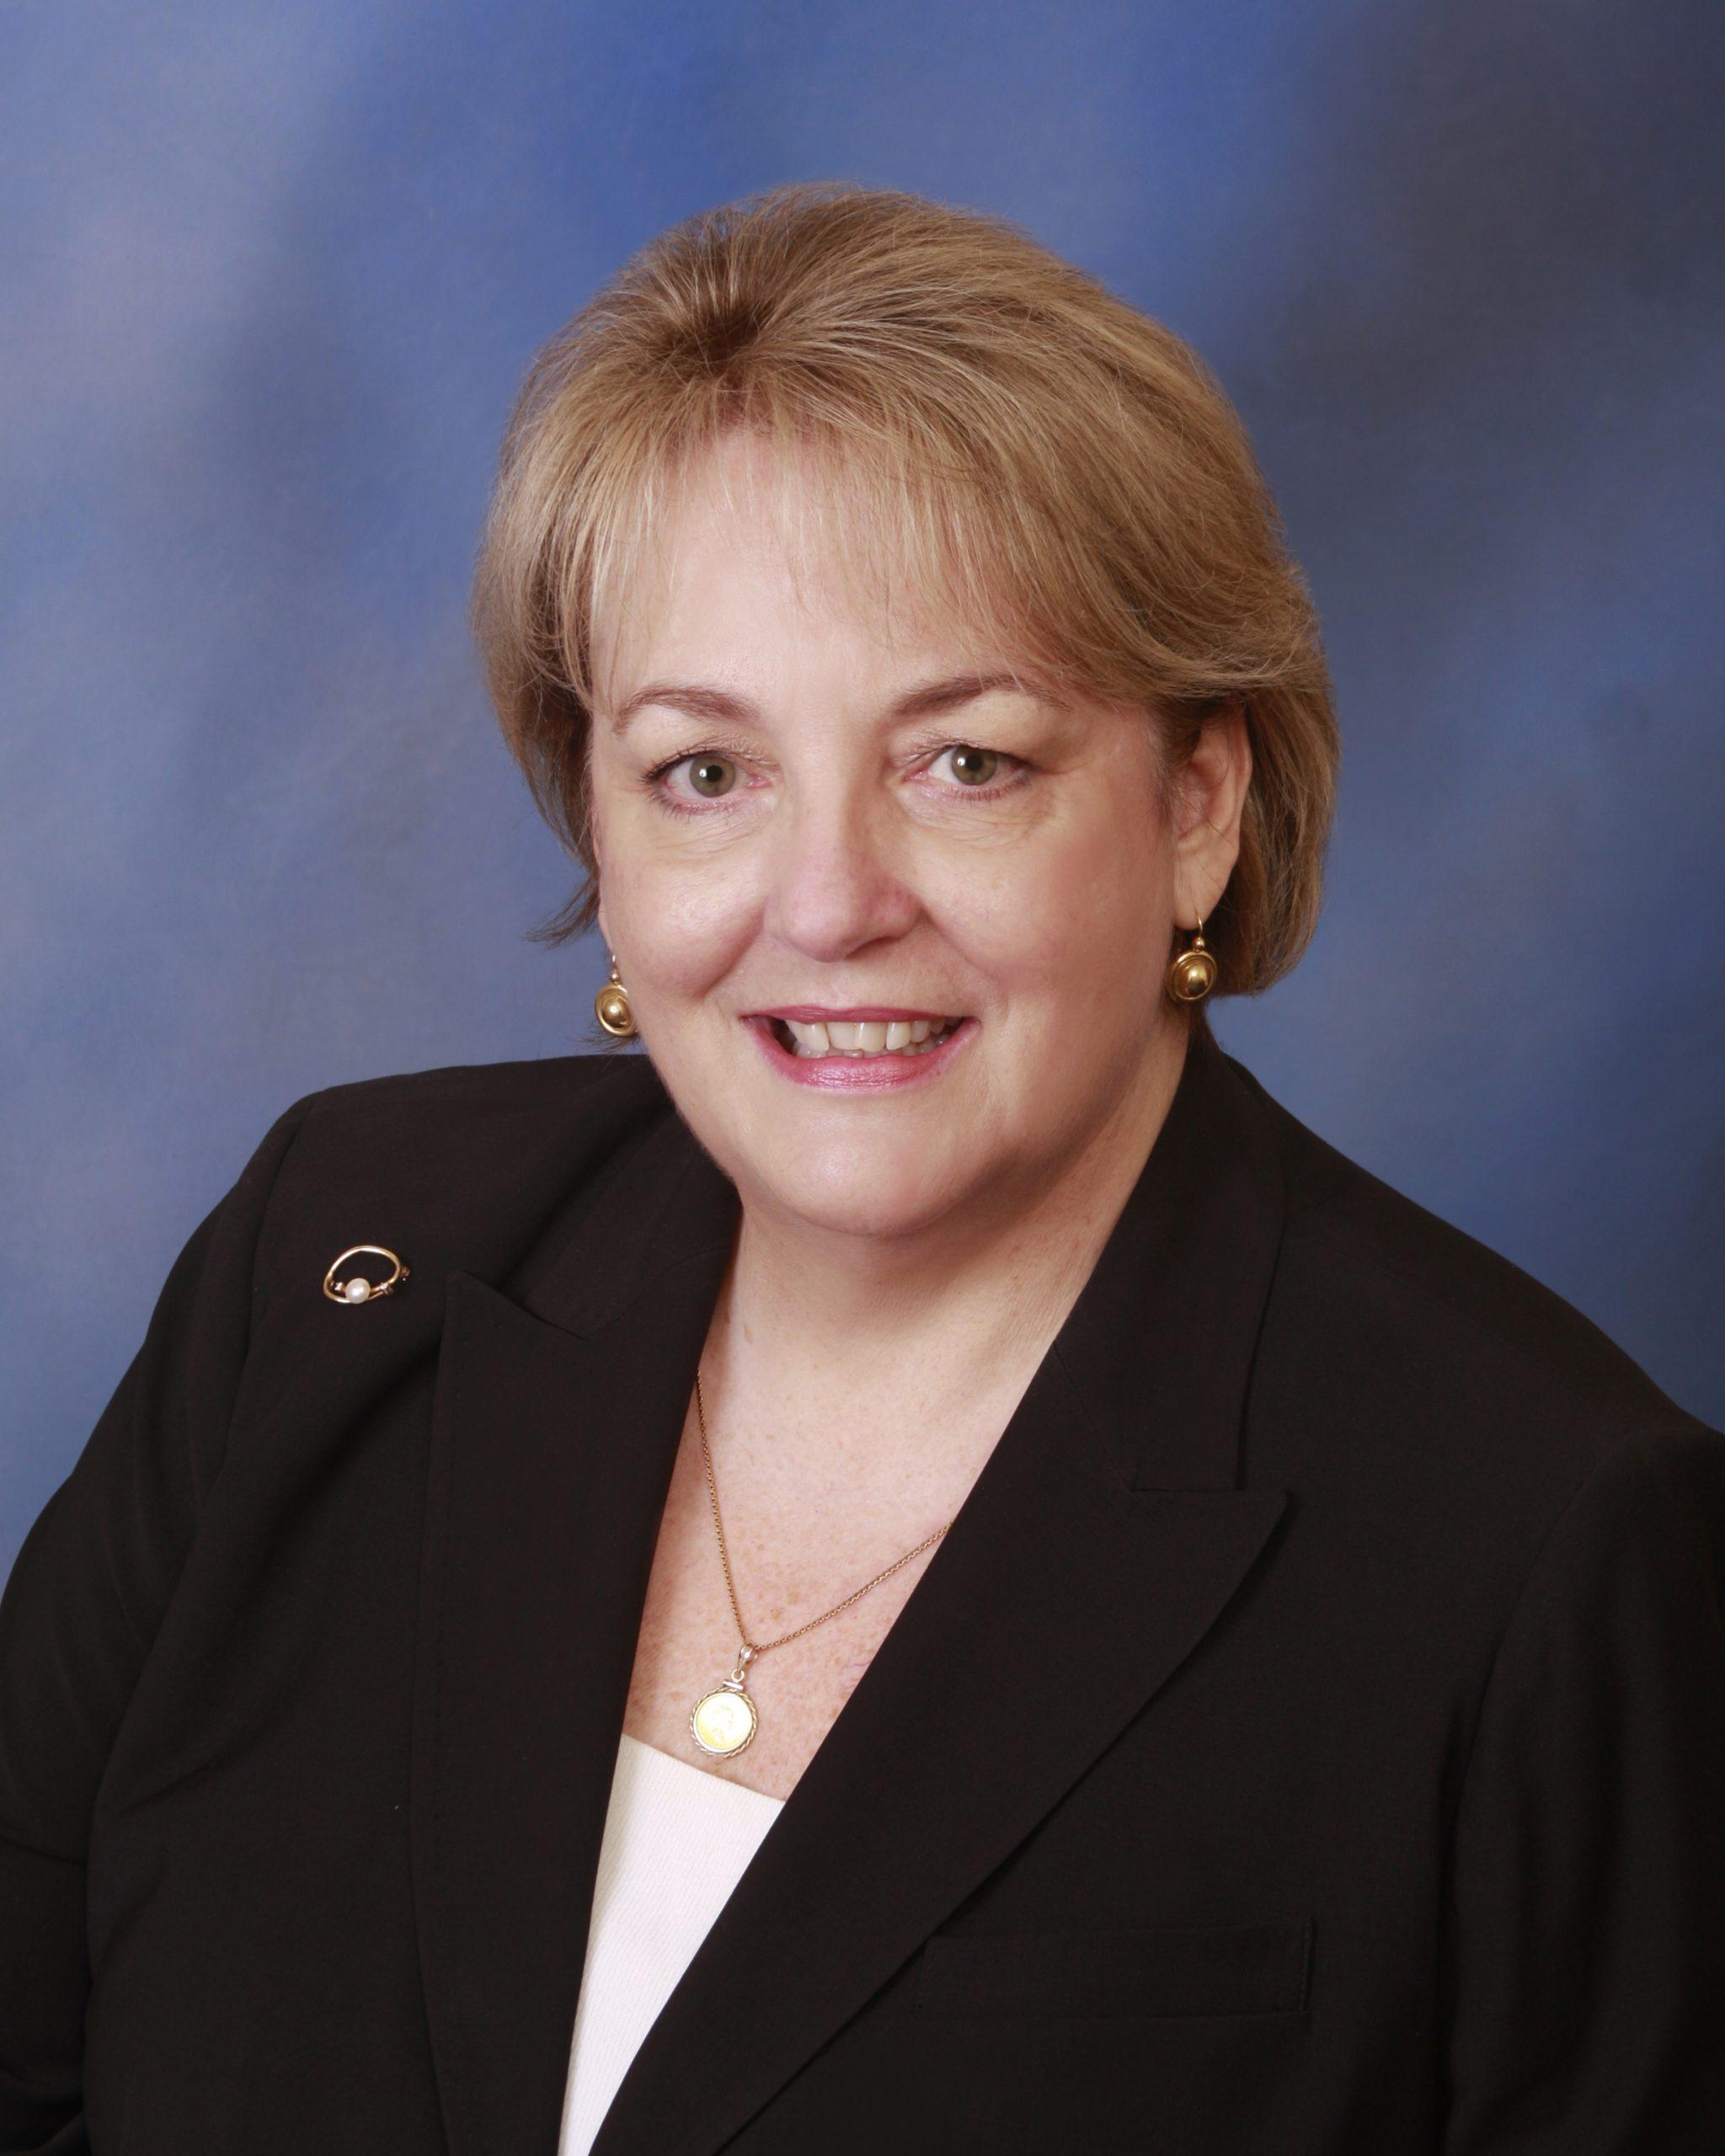 Linda A. Cunabaugh